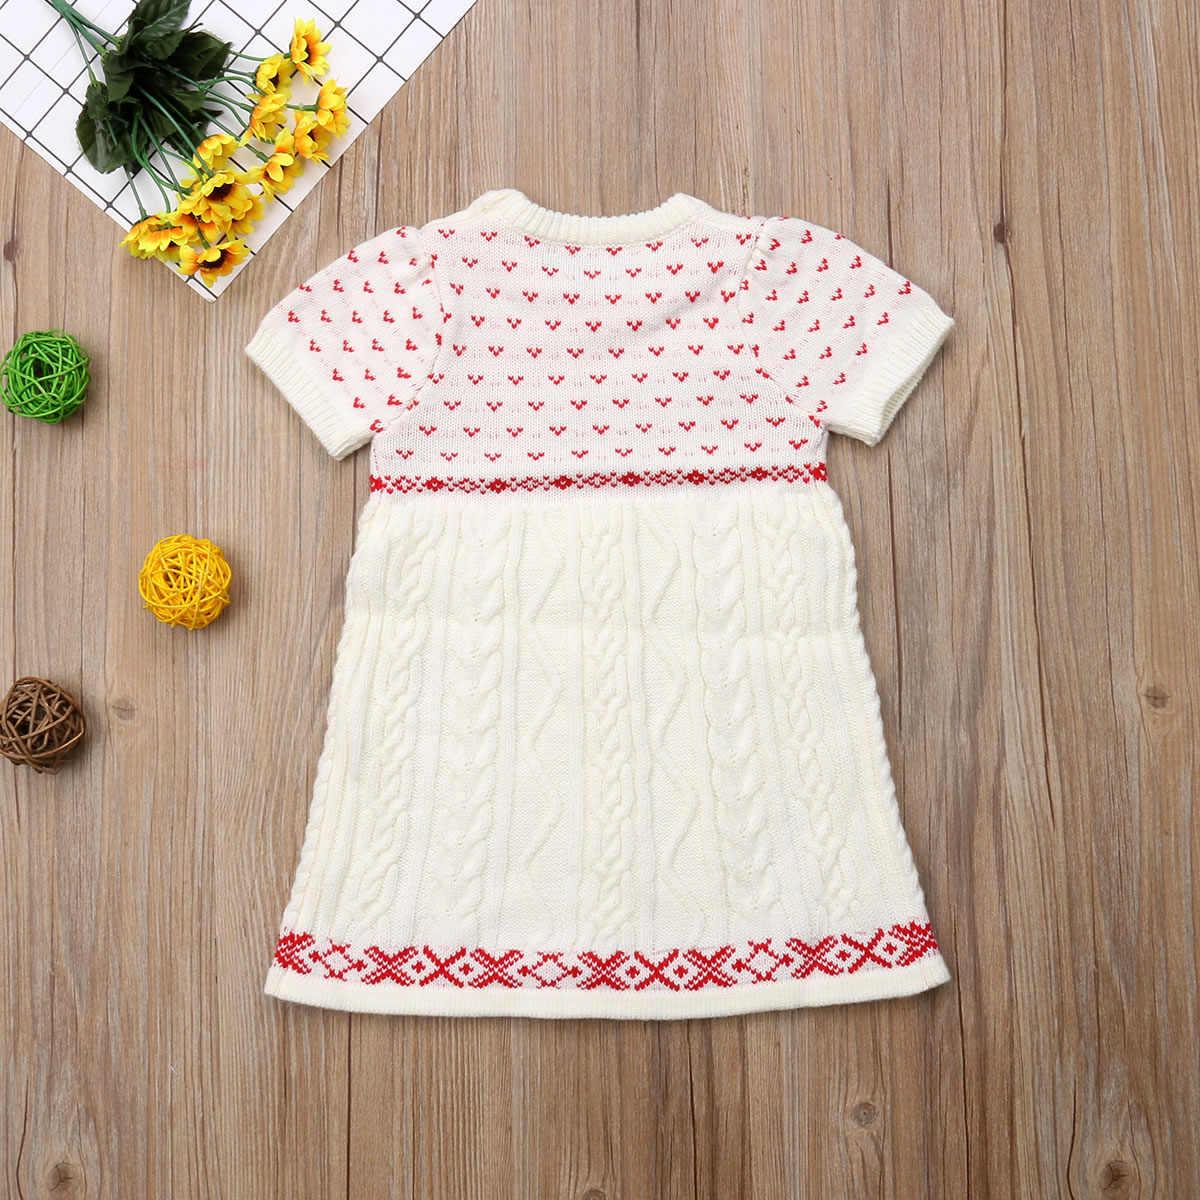 8831733493cf6 Girl Knitting Wool Sweater Warm Crochet Dress Autumn Cute Clothes Christmas  Newborn Kids Baby Girls Dresses Clothing 6M-5T